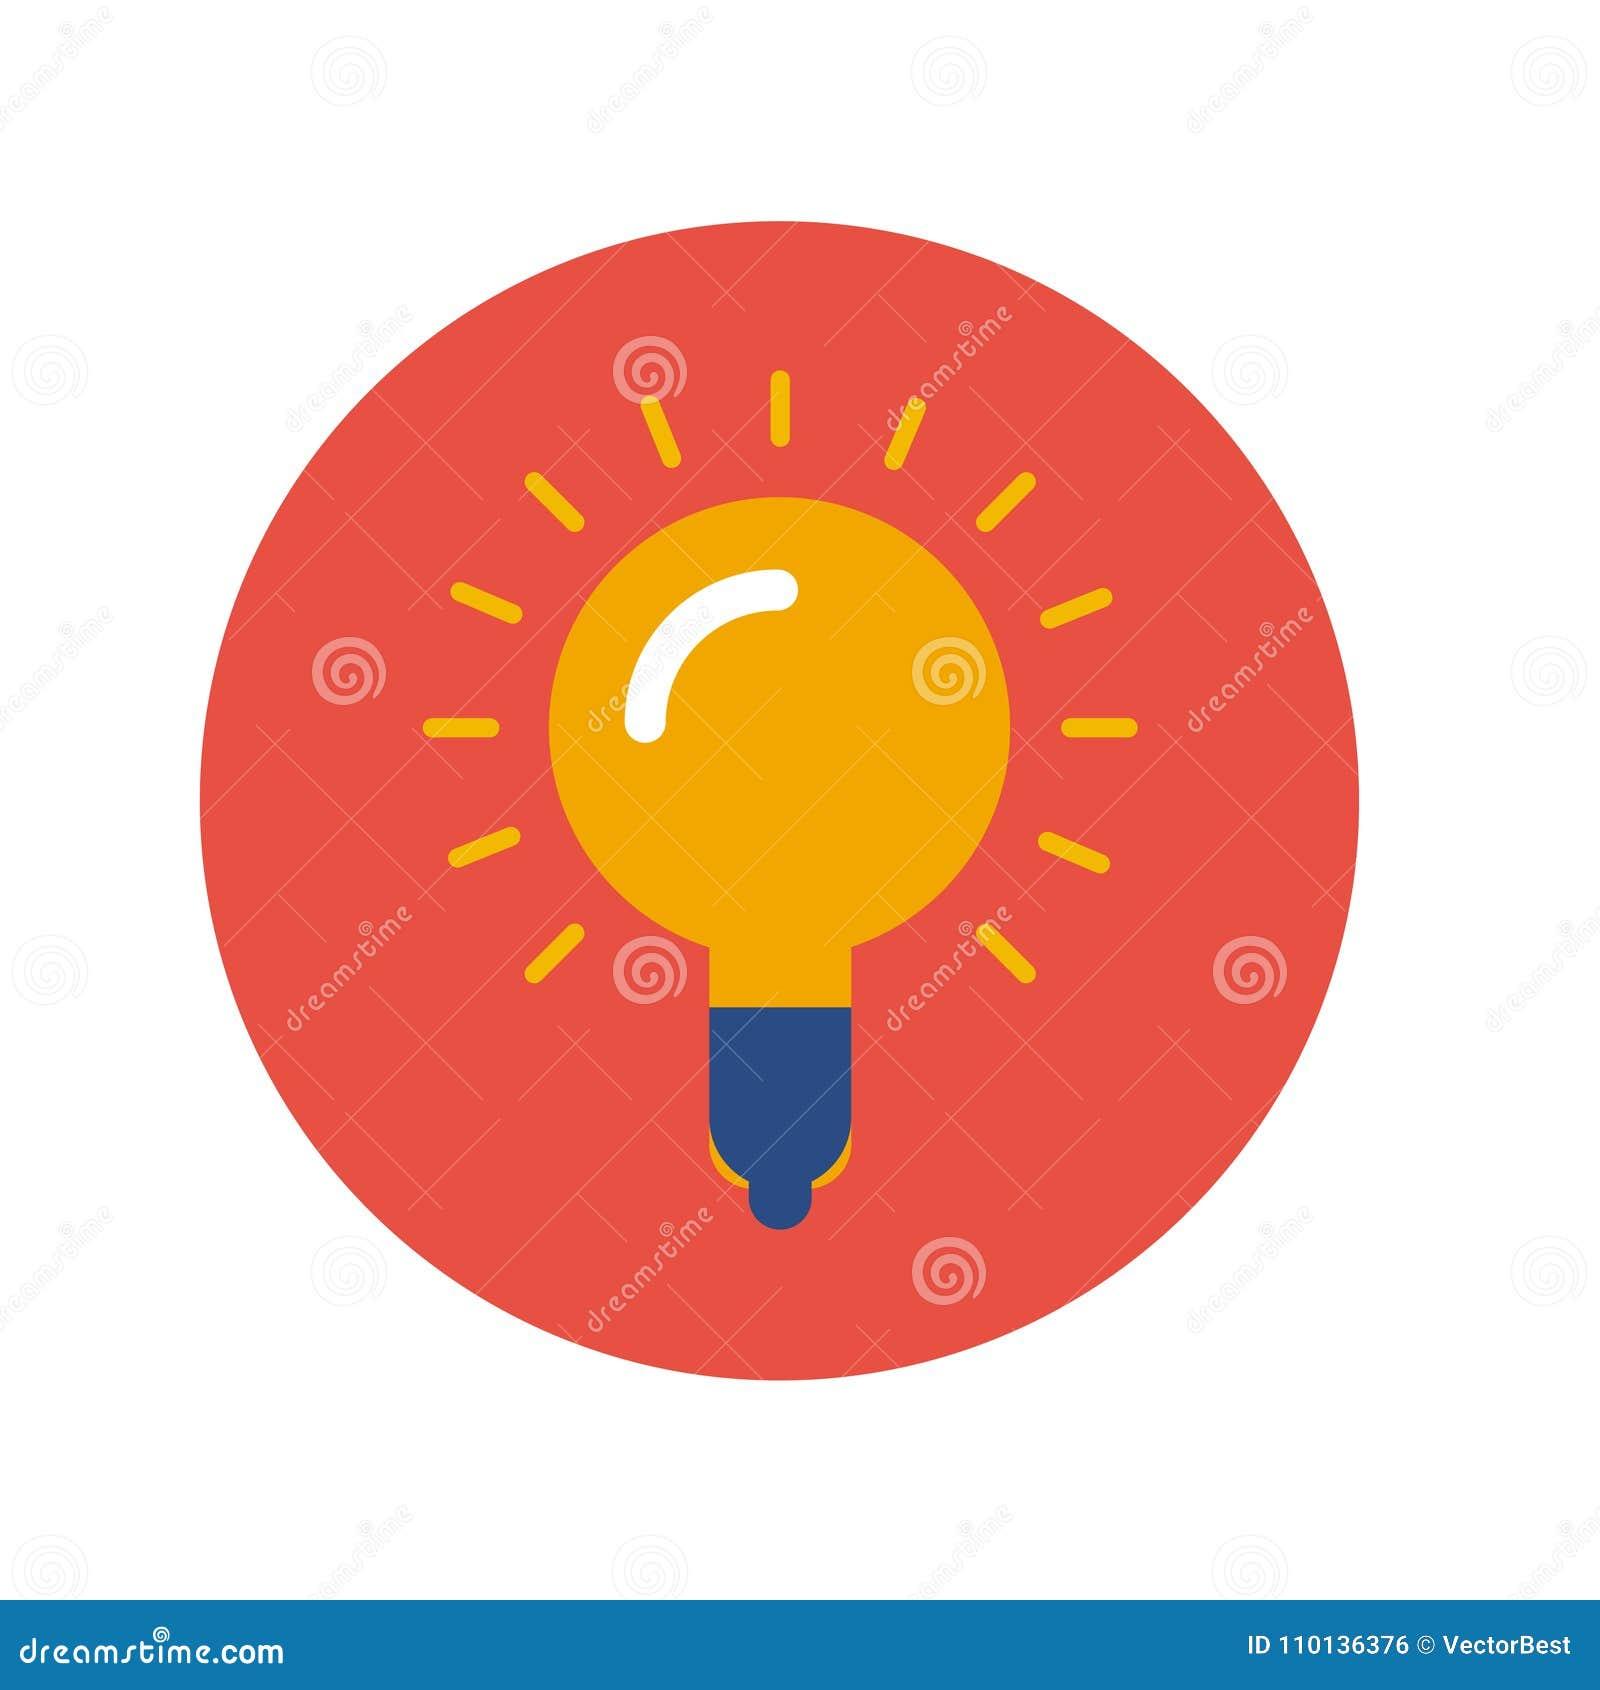 Yellow Lamp Icon On Red Background Stock Illustration Illustration